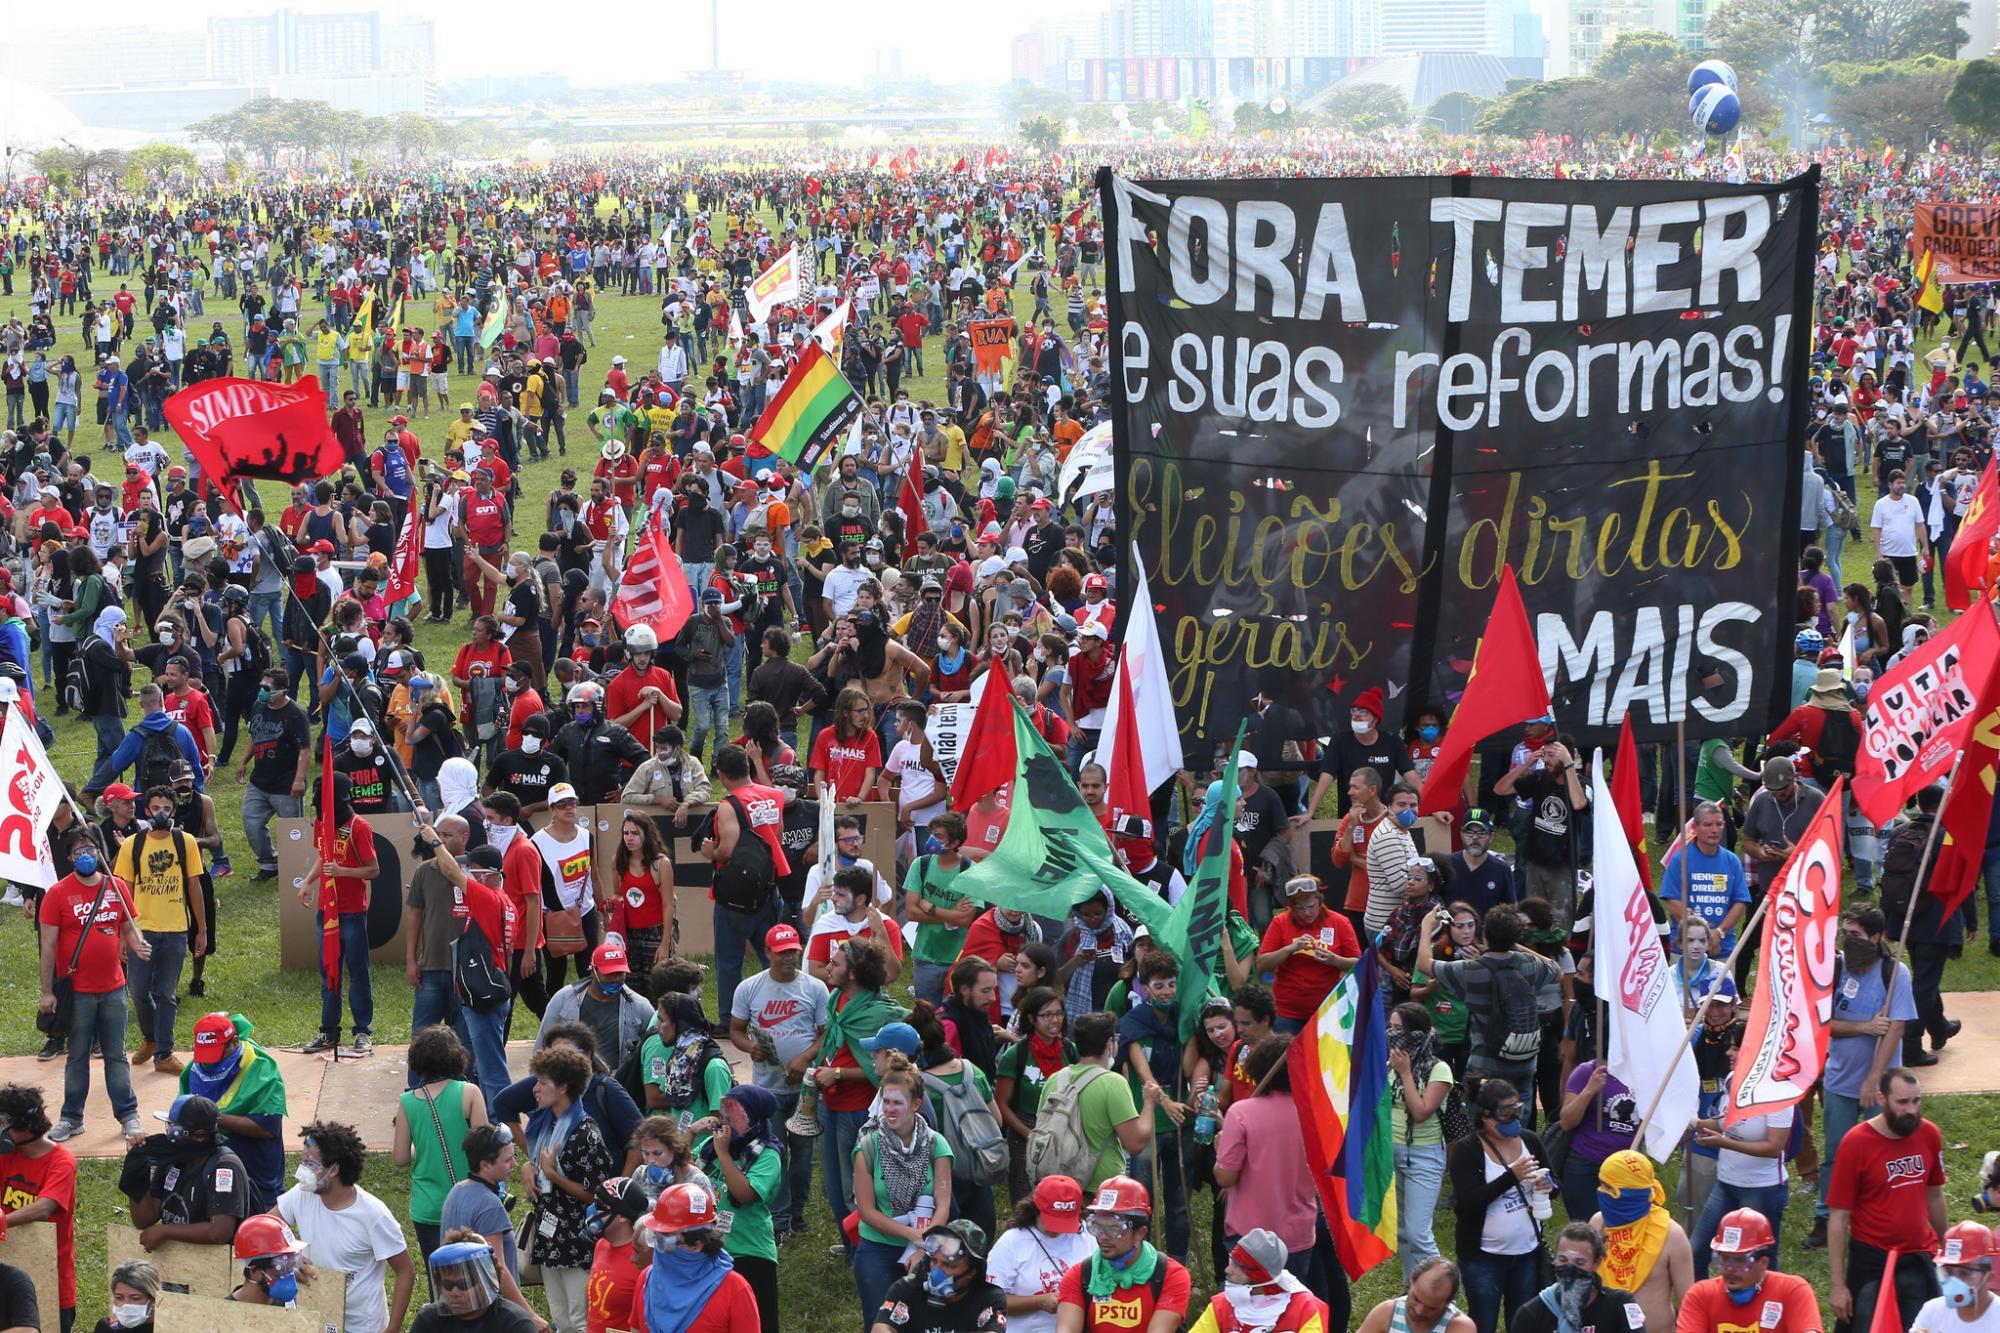 Entidades do Alto Vale organizam para protesto contra reformas propostas pelo governo Michel Temer